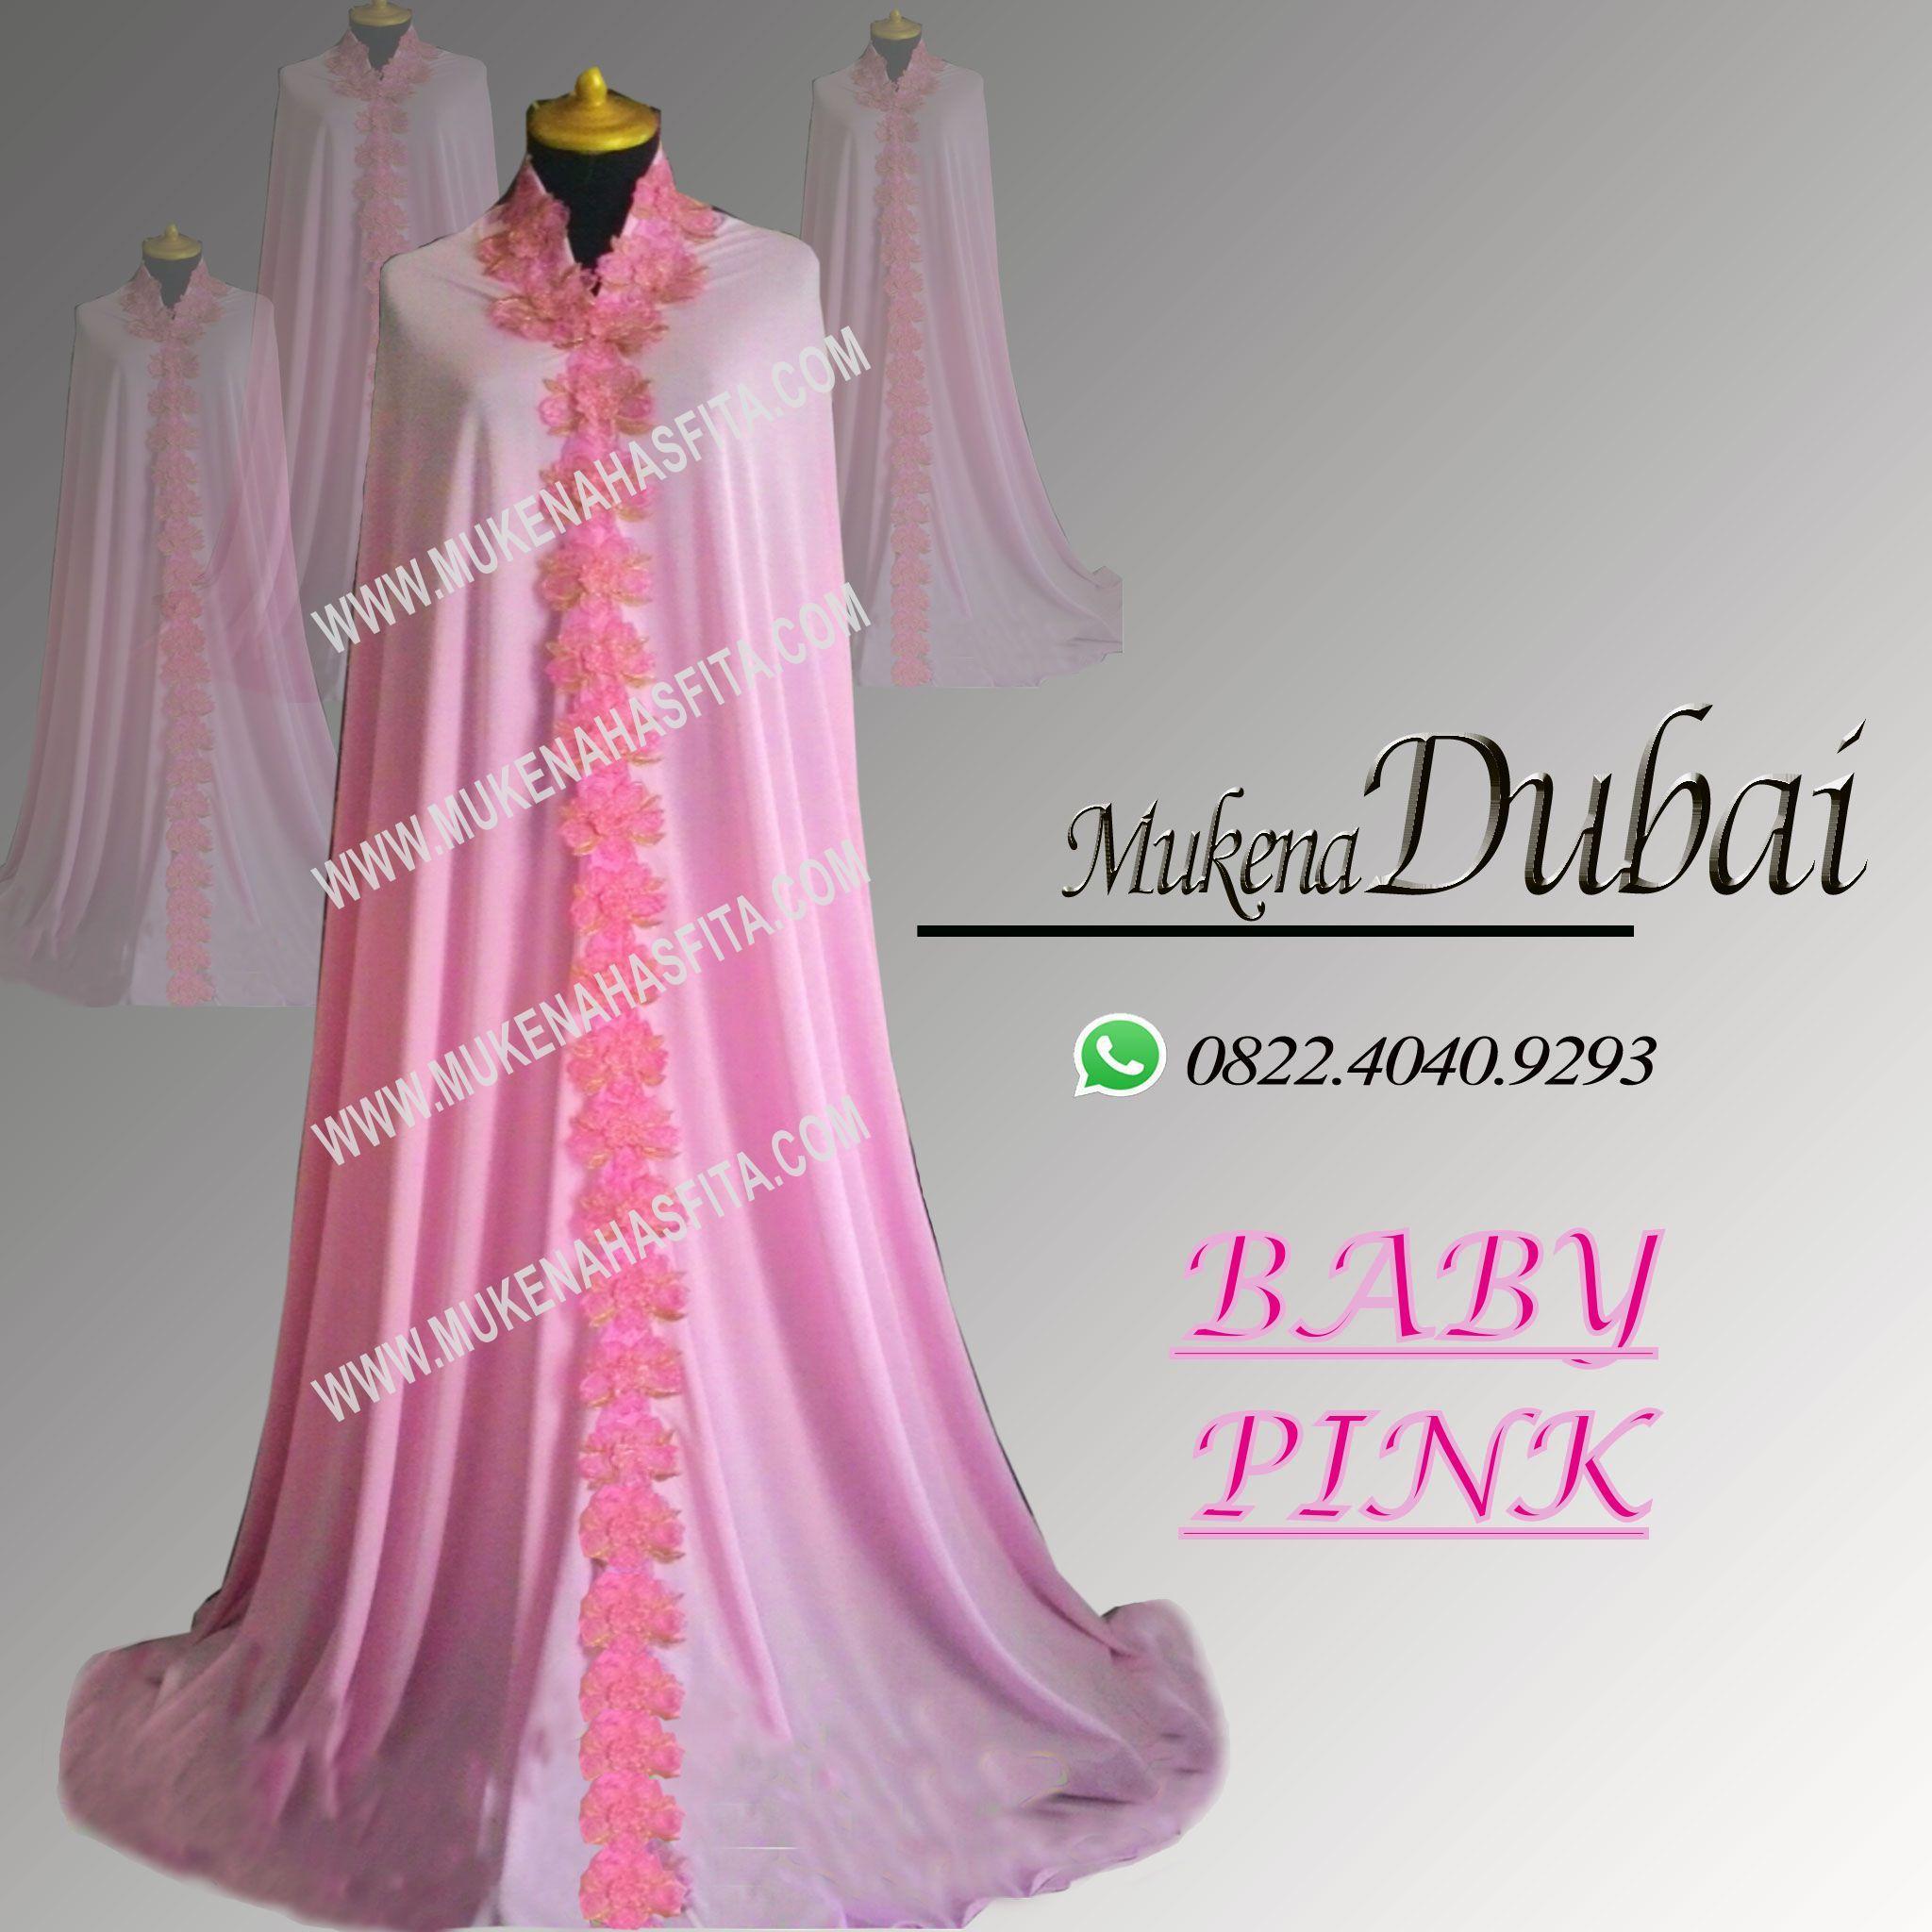 Rukuh Anak Mukena Dubai Elegan Rukuh Anak Lucu Mukena Dubai